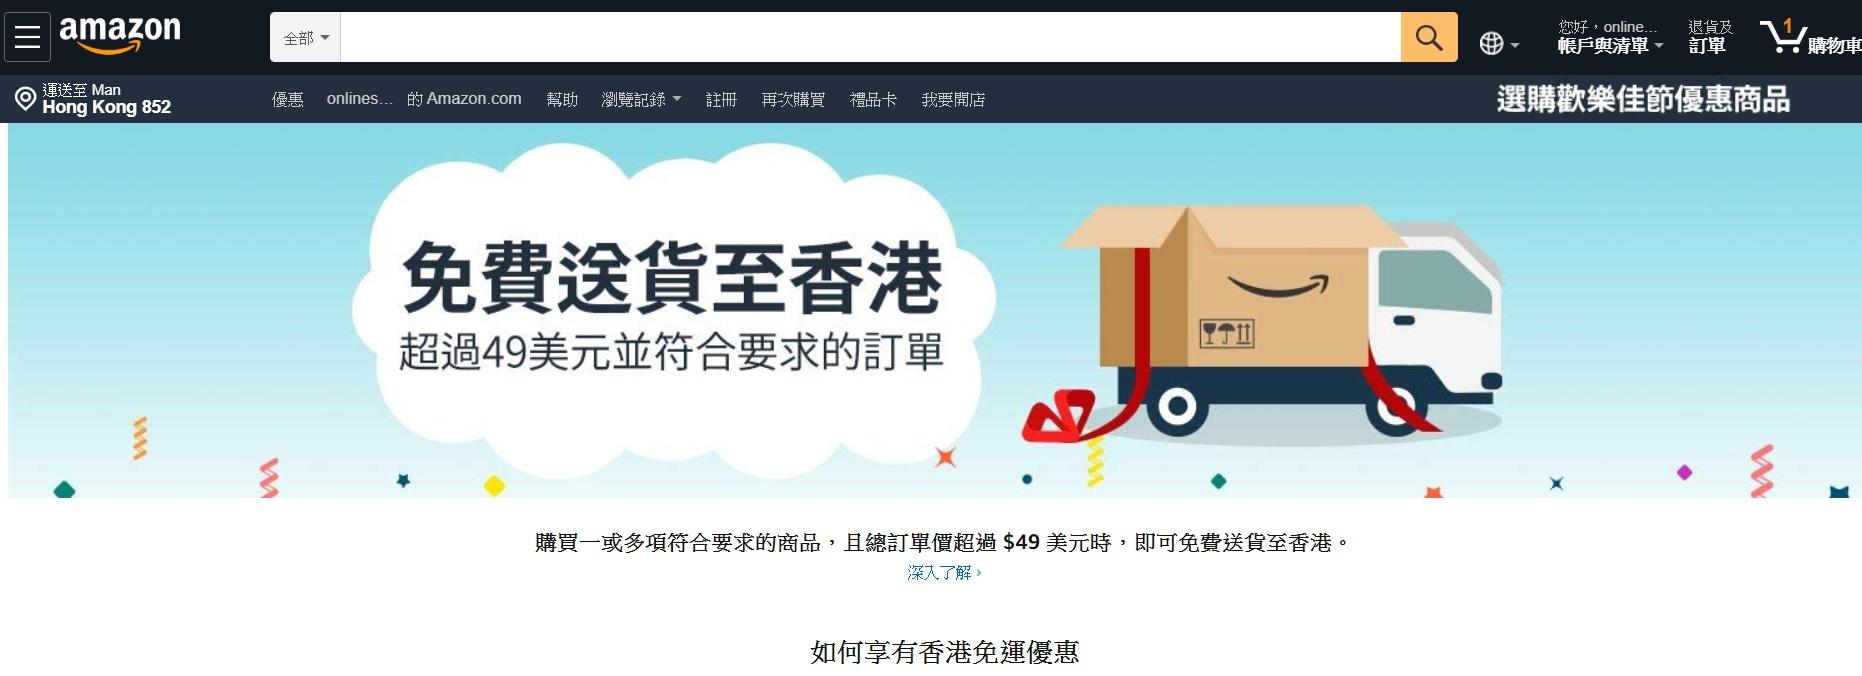 amazon hk promo